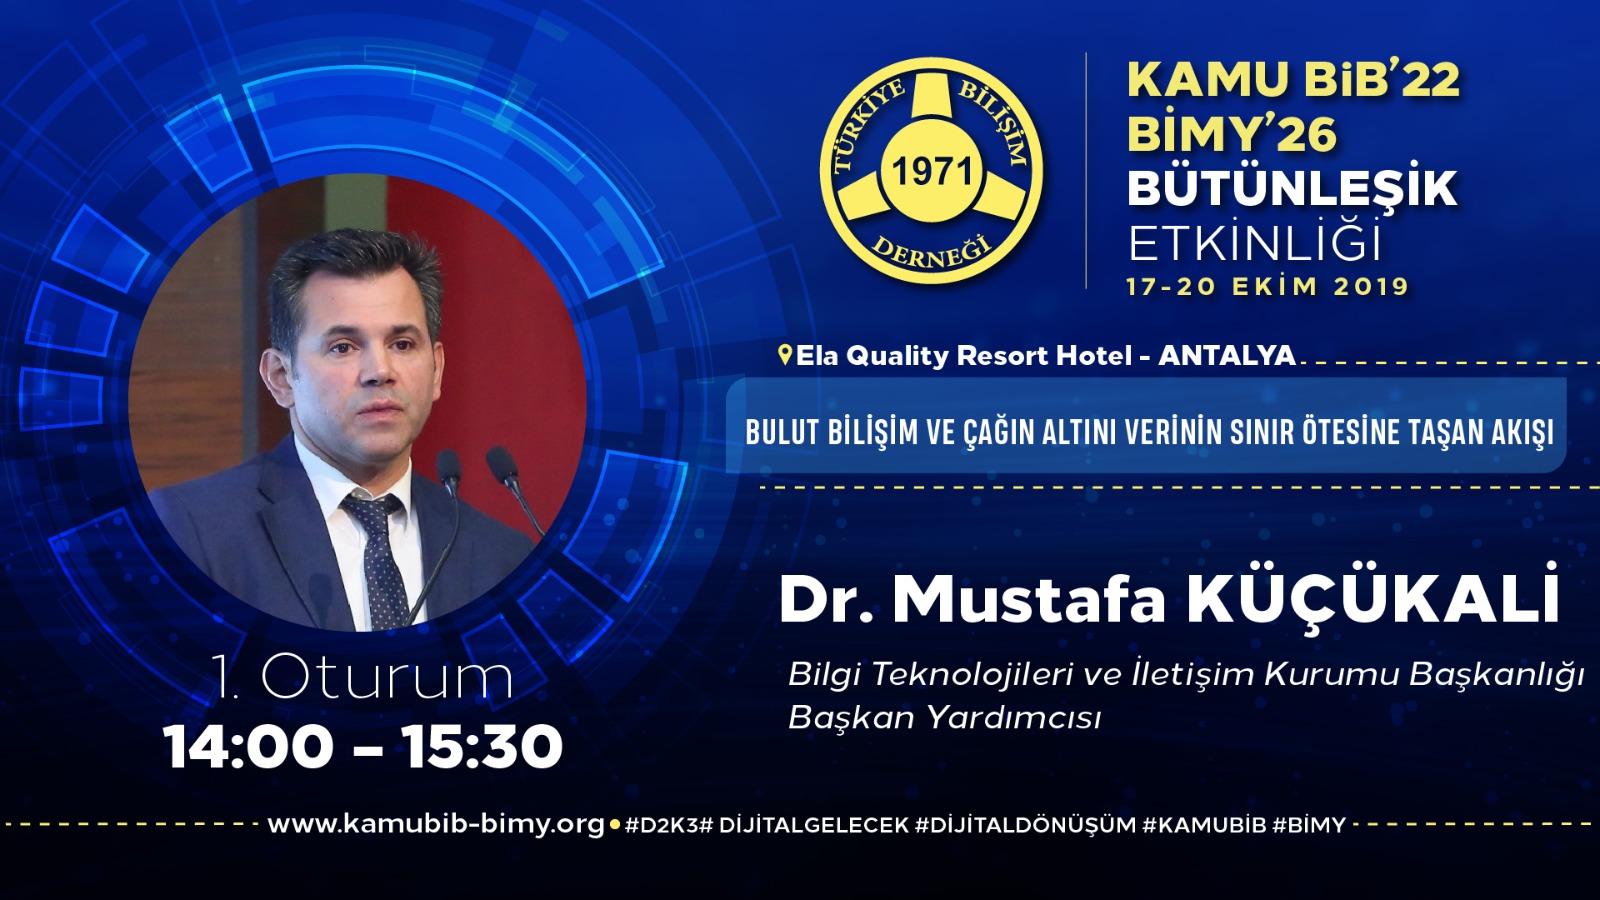 Dr. Mustafa KÜÇÜKALİ - KamuBİB'22 BİMY'26